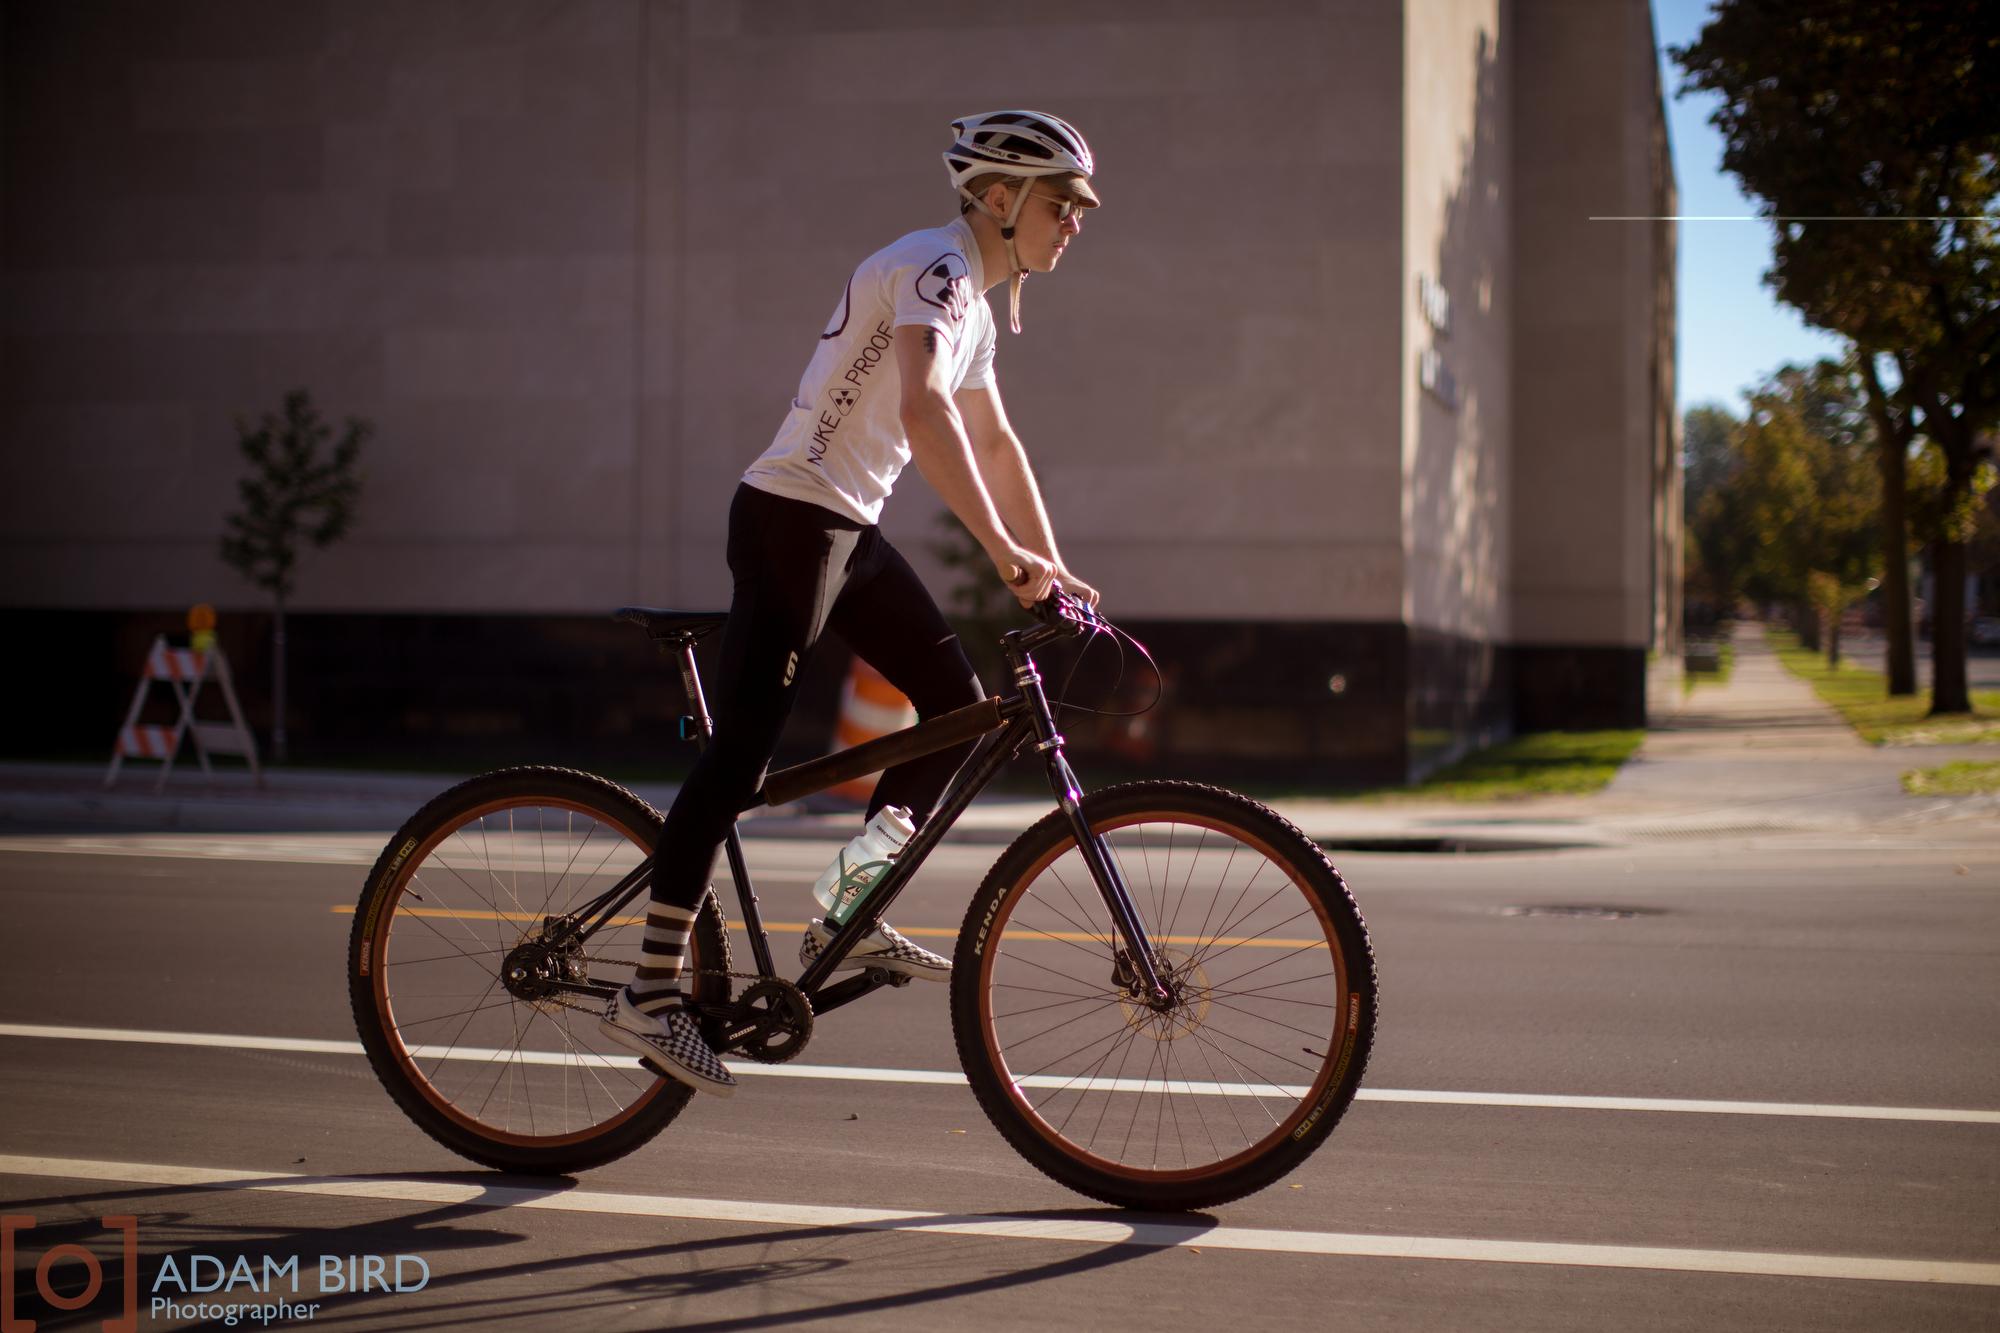 josh_mcvety_bike_lanes_03.JPG